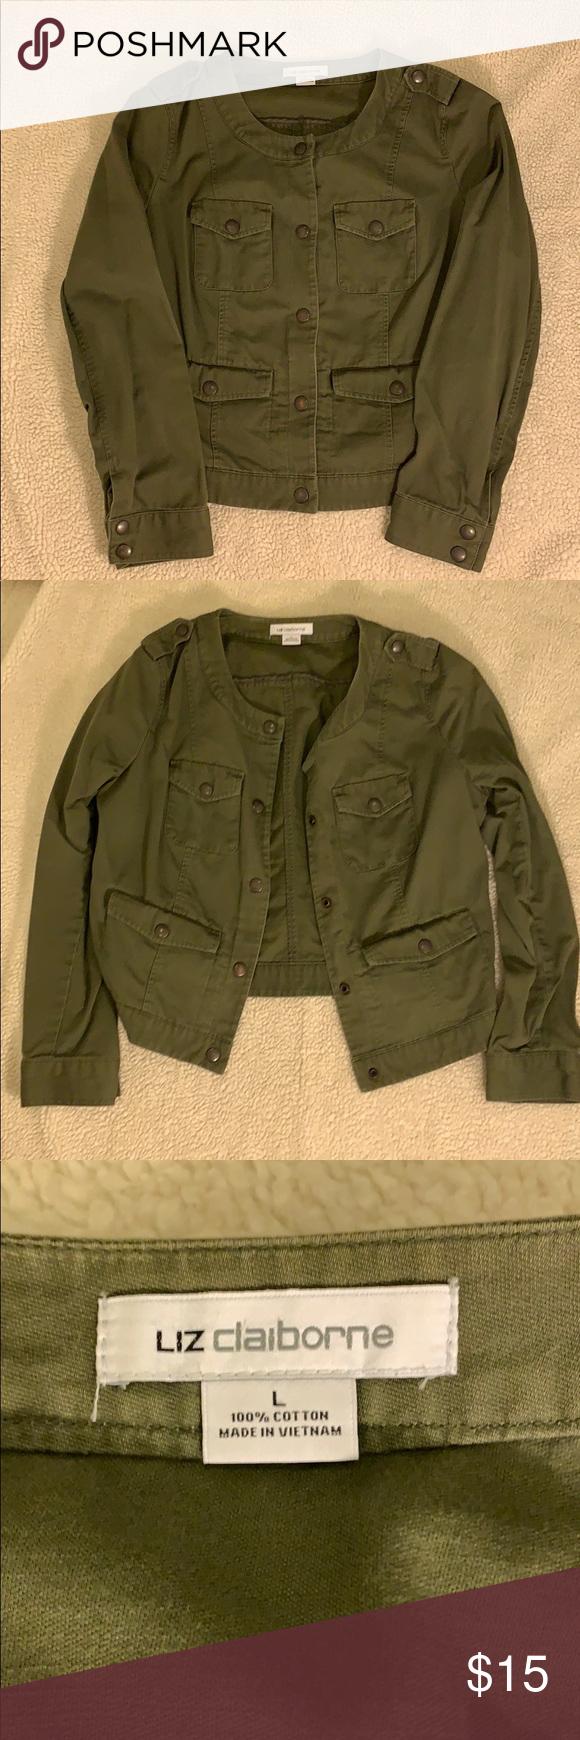 Liz Claiborne Jacket Green Jacket Liz Claiborne Jackets Coats Jackets Clothes Design Claiborne [ 1740 x 580 Pixel ]